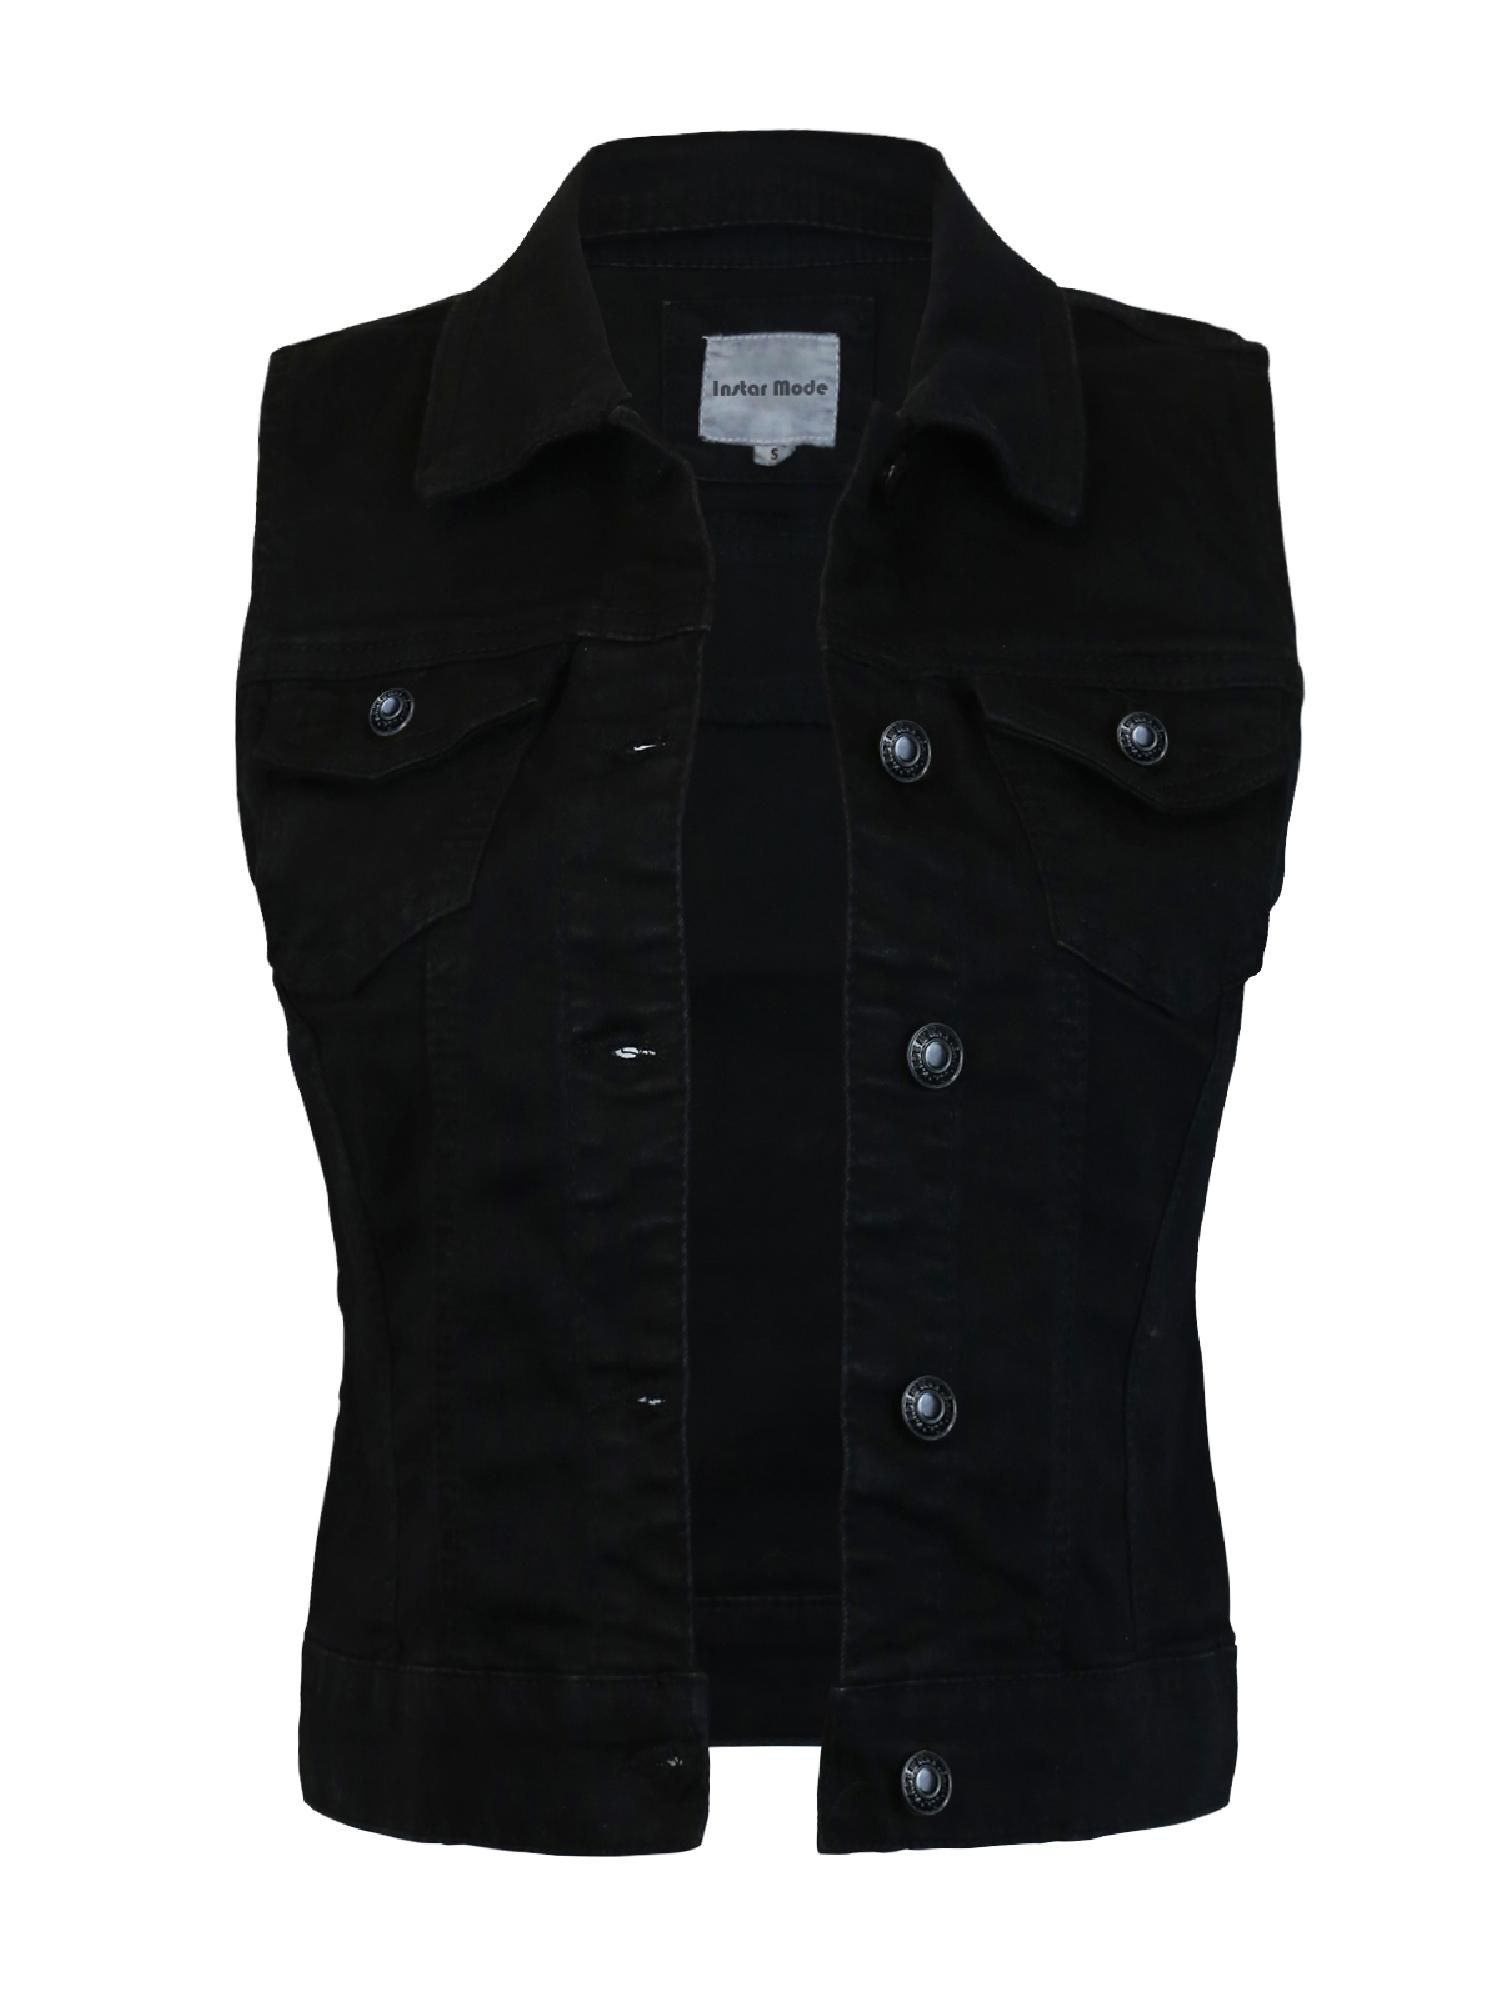 Made By Olivia Made By Olivia Women S Sleeveless Button Up Jean Denim Jacket Vest Walmart Com Black Denim Vest Jean Jacket Vest Vintage Denim Jeans [ 2000 x 1500 Pixel ]